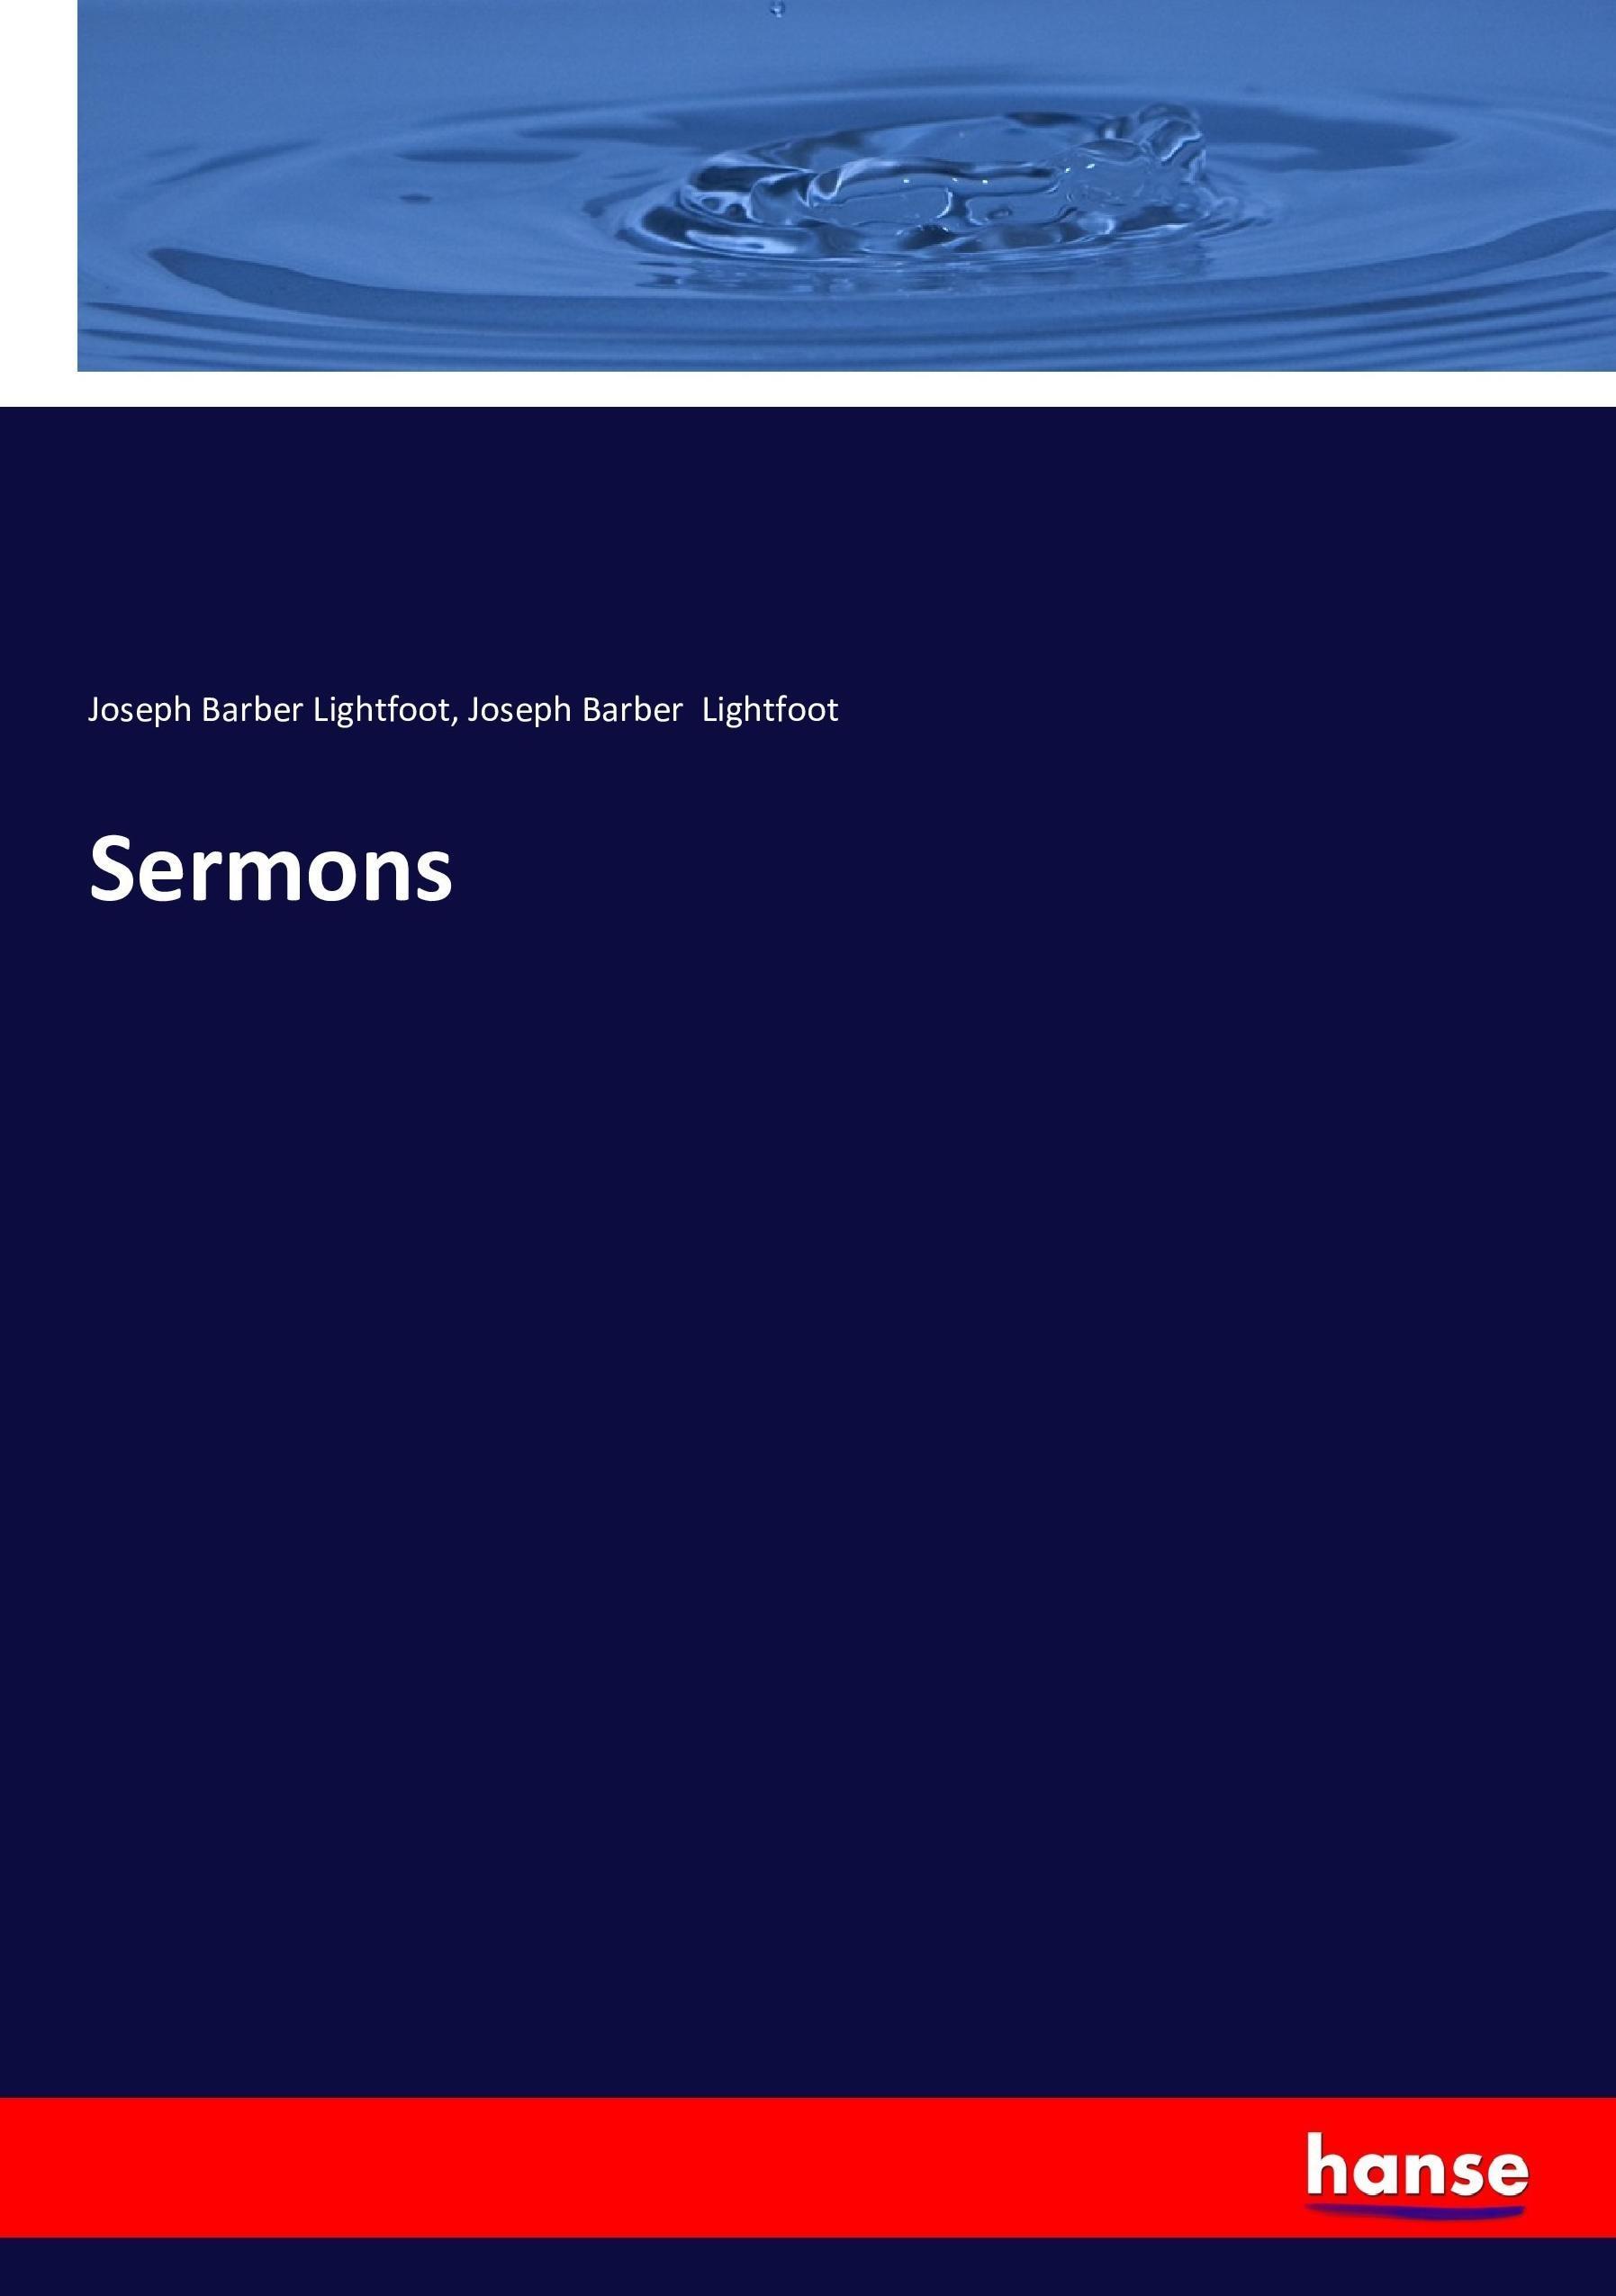 Sermons-Joseph-Barber-Lightfoot